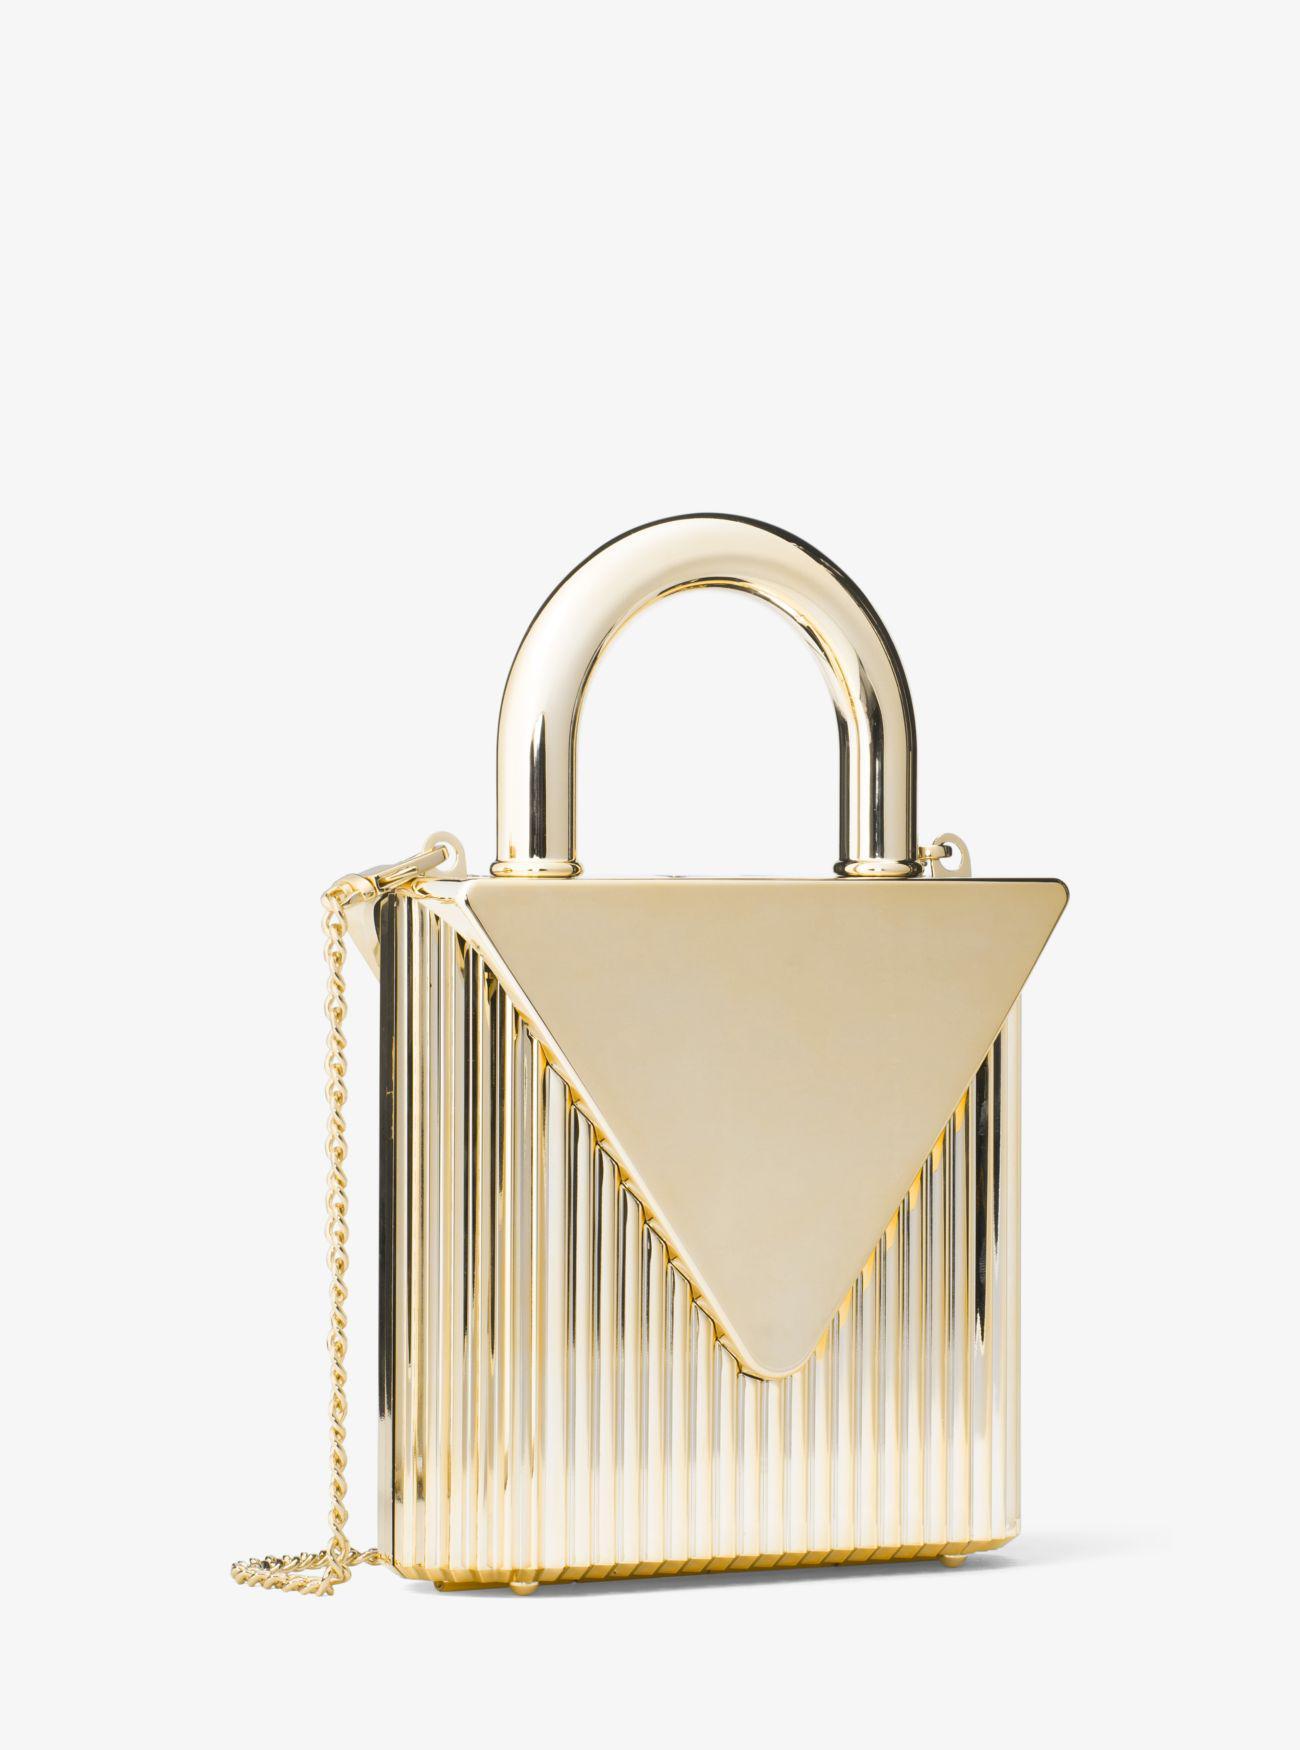 0363d62c2a29 Michael Kors Mercer Lock Clutch in Metallic - Lyst